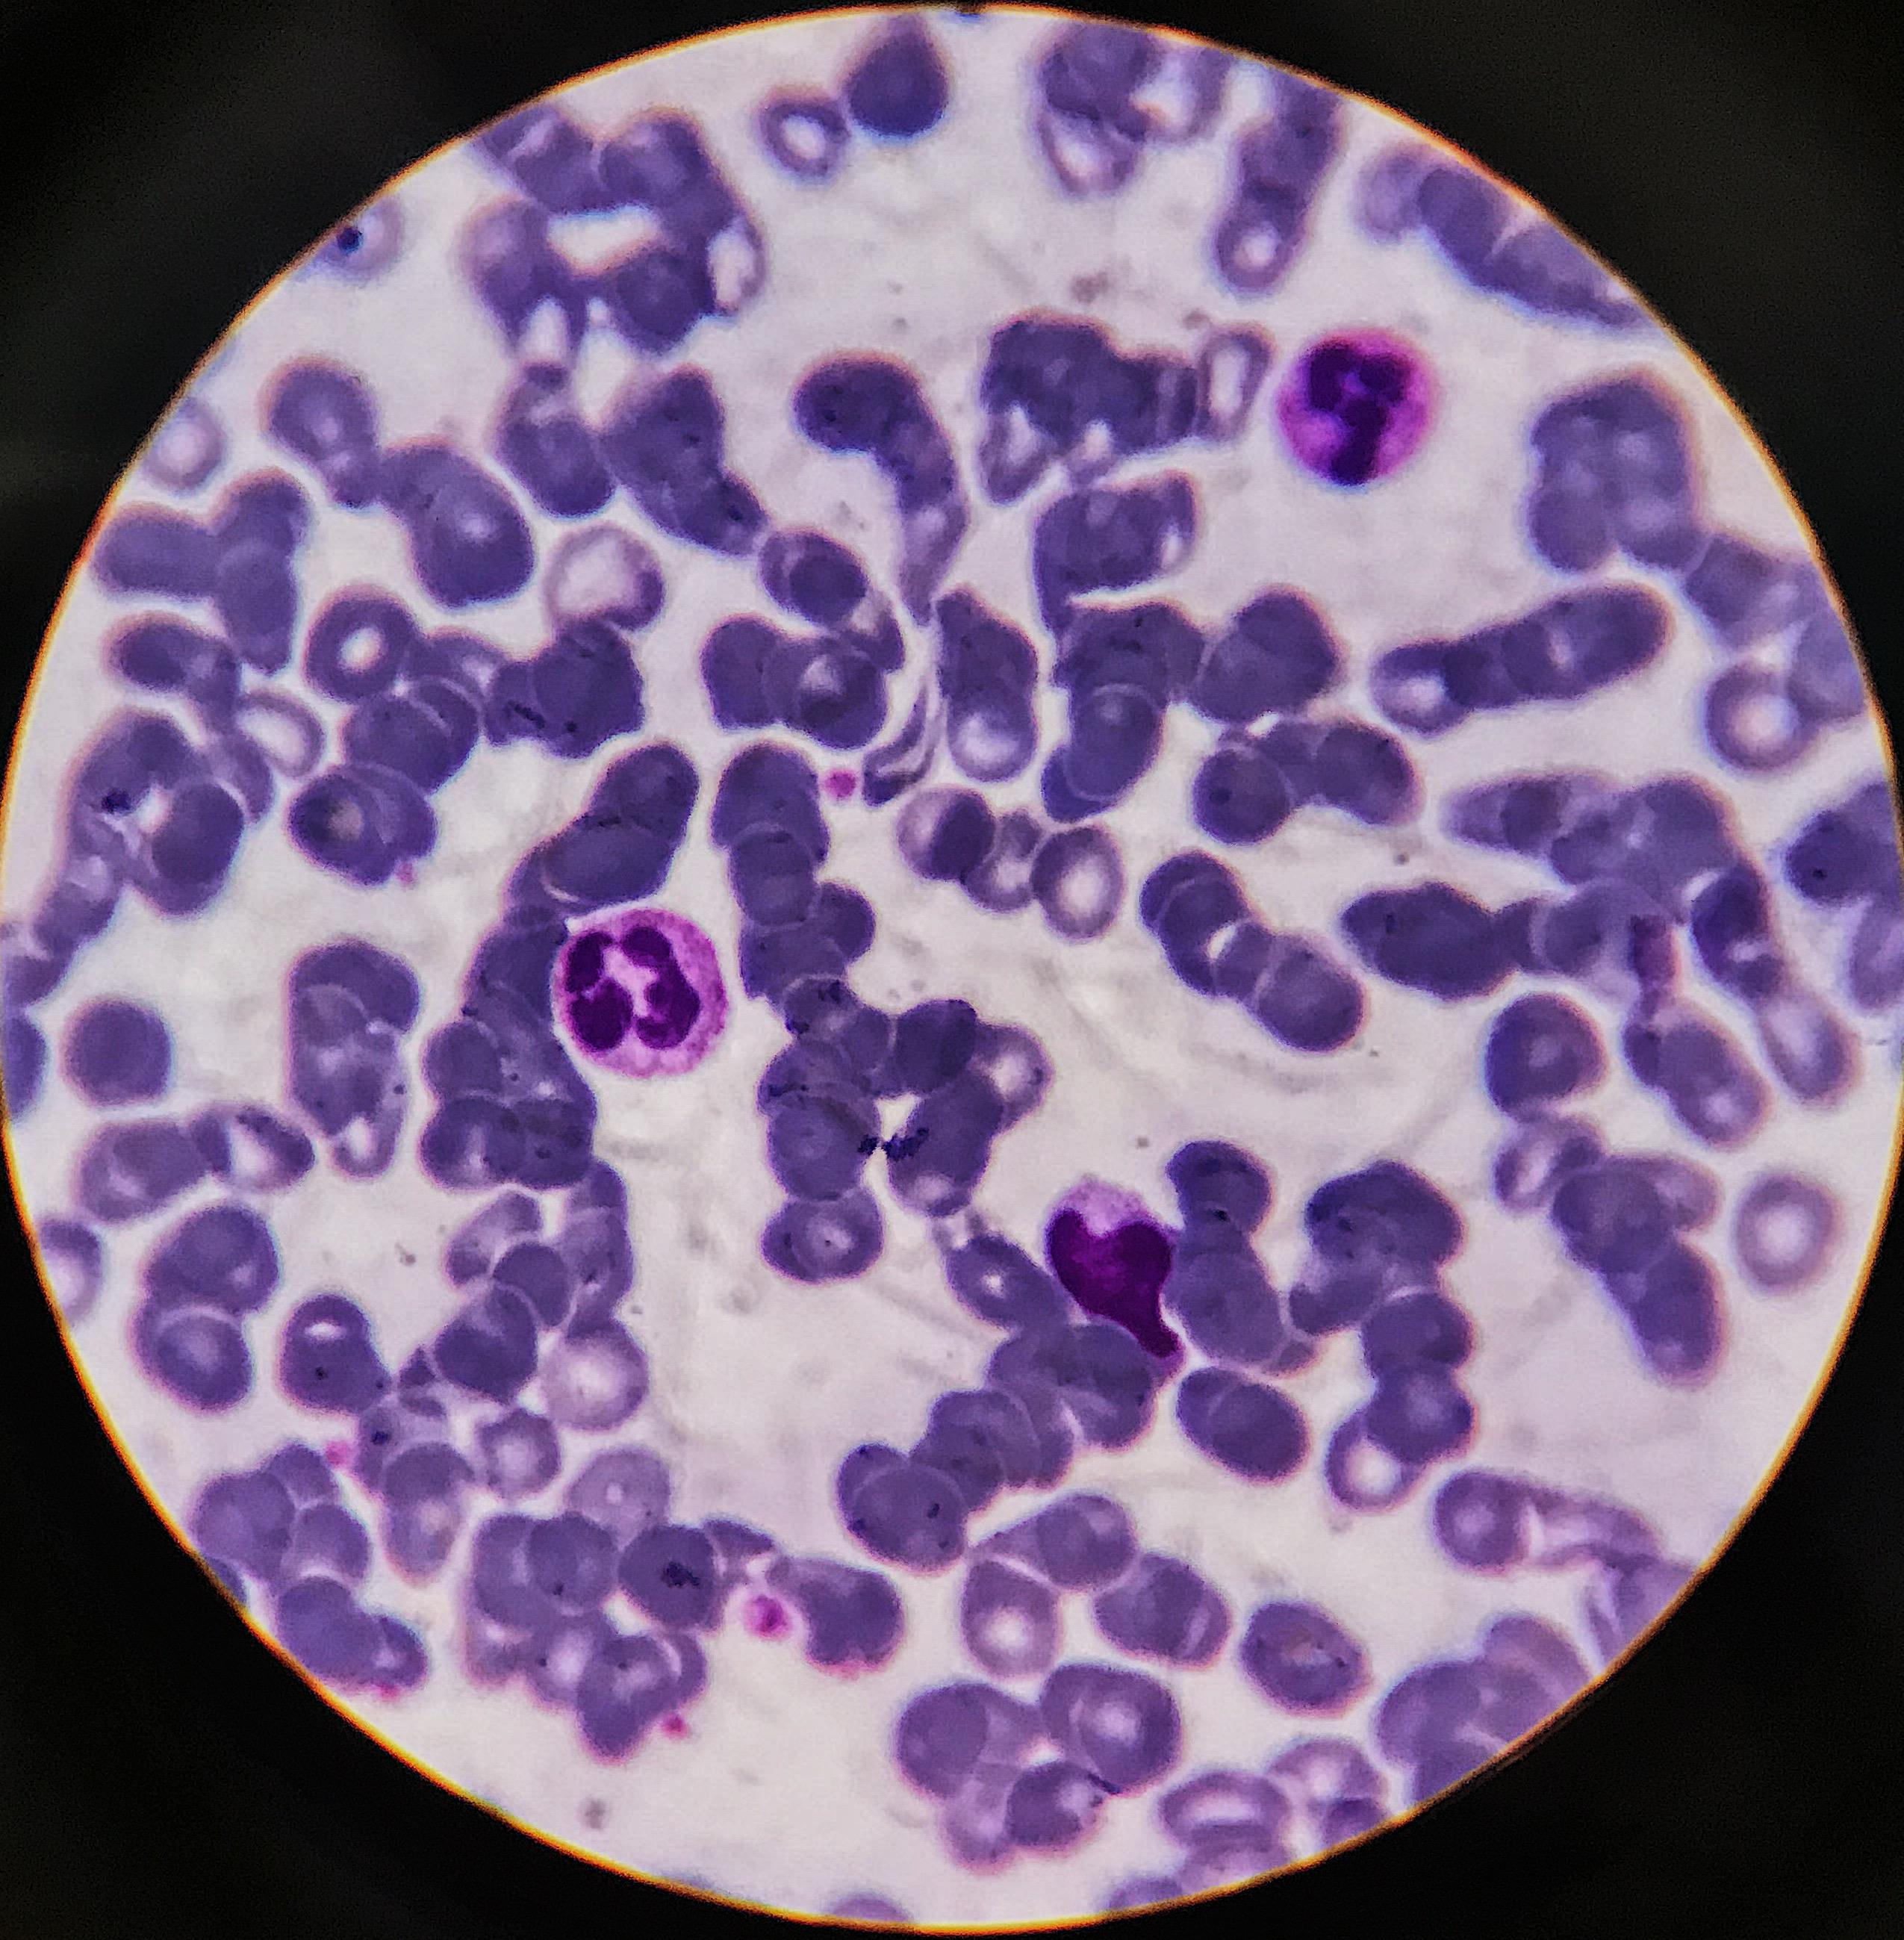 Myeloid leukemia treatment with tioridazina analogues